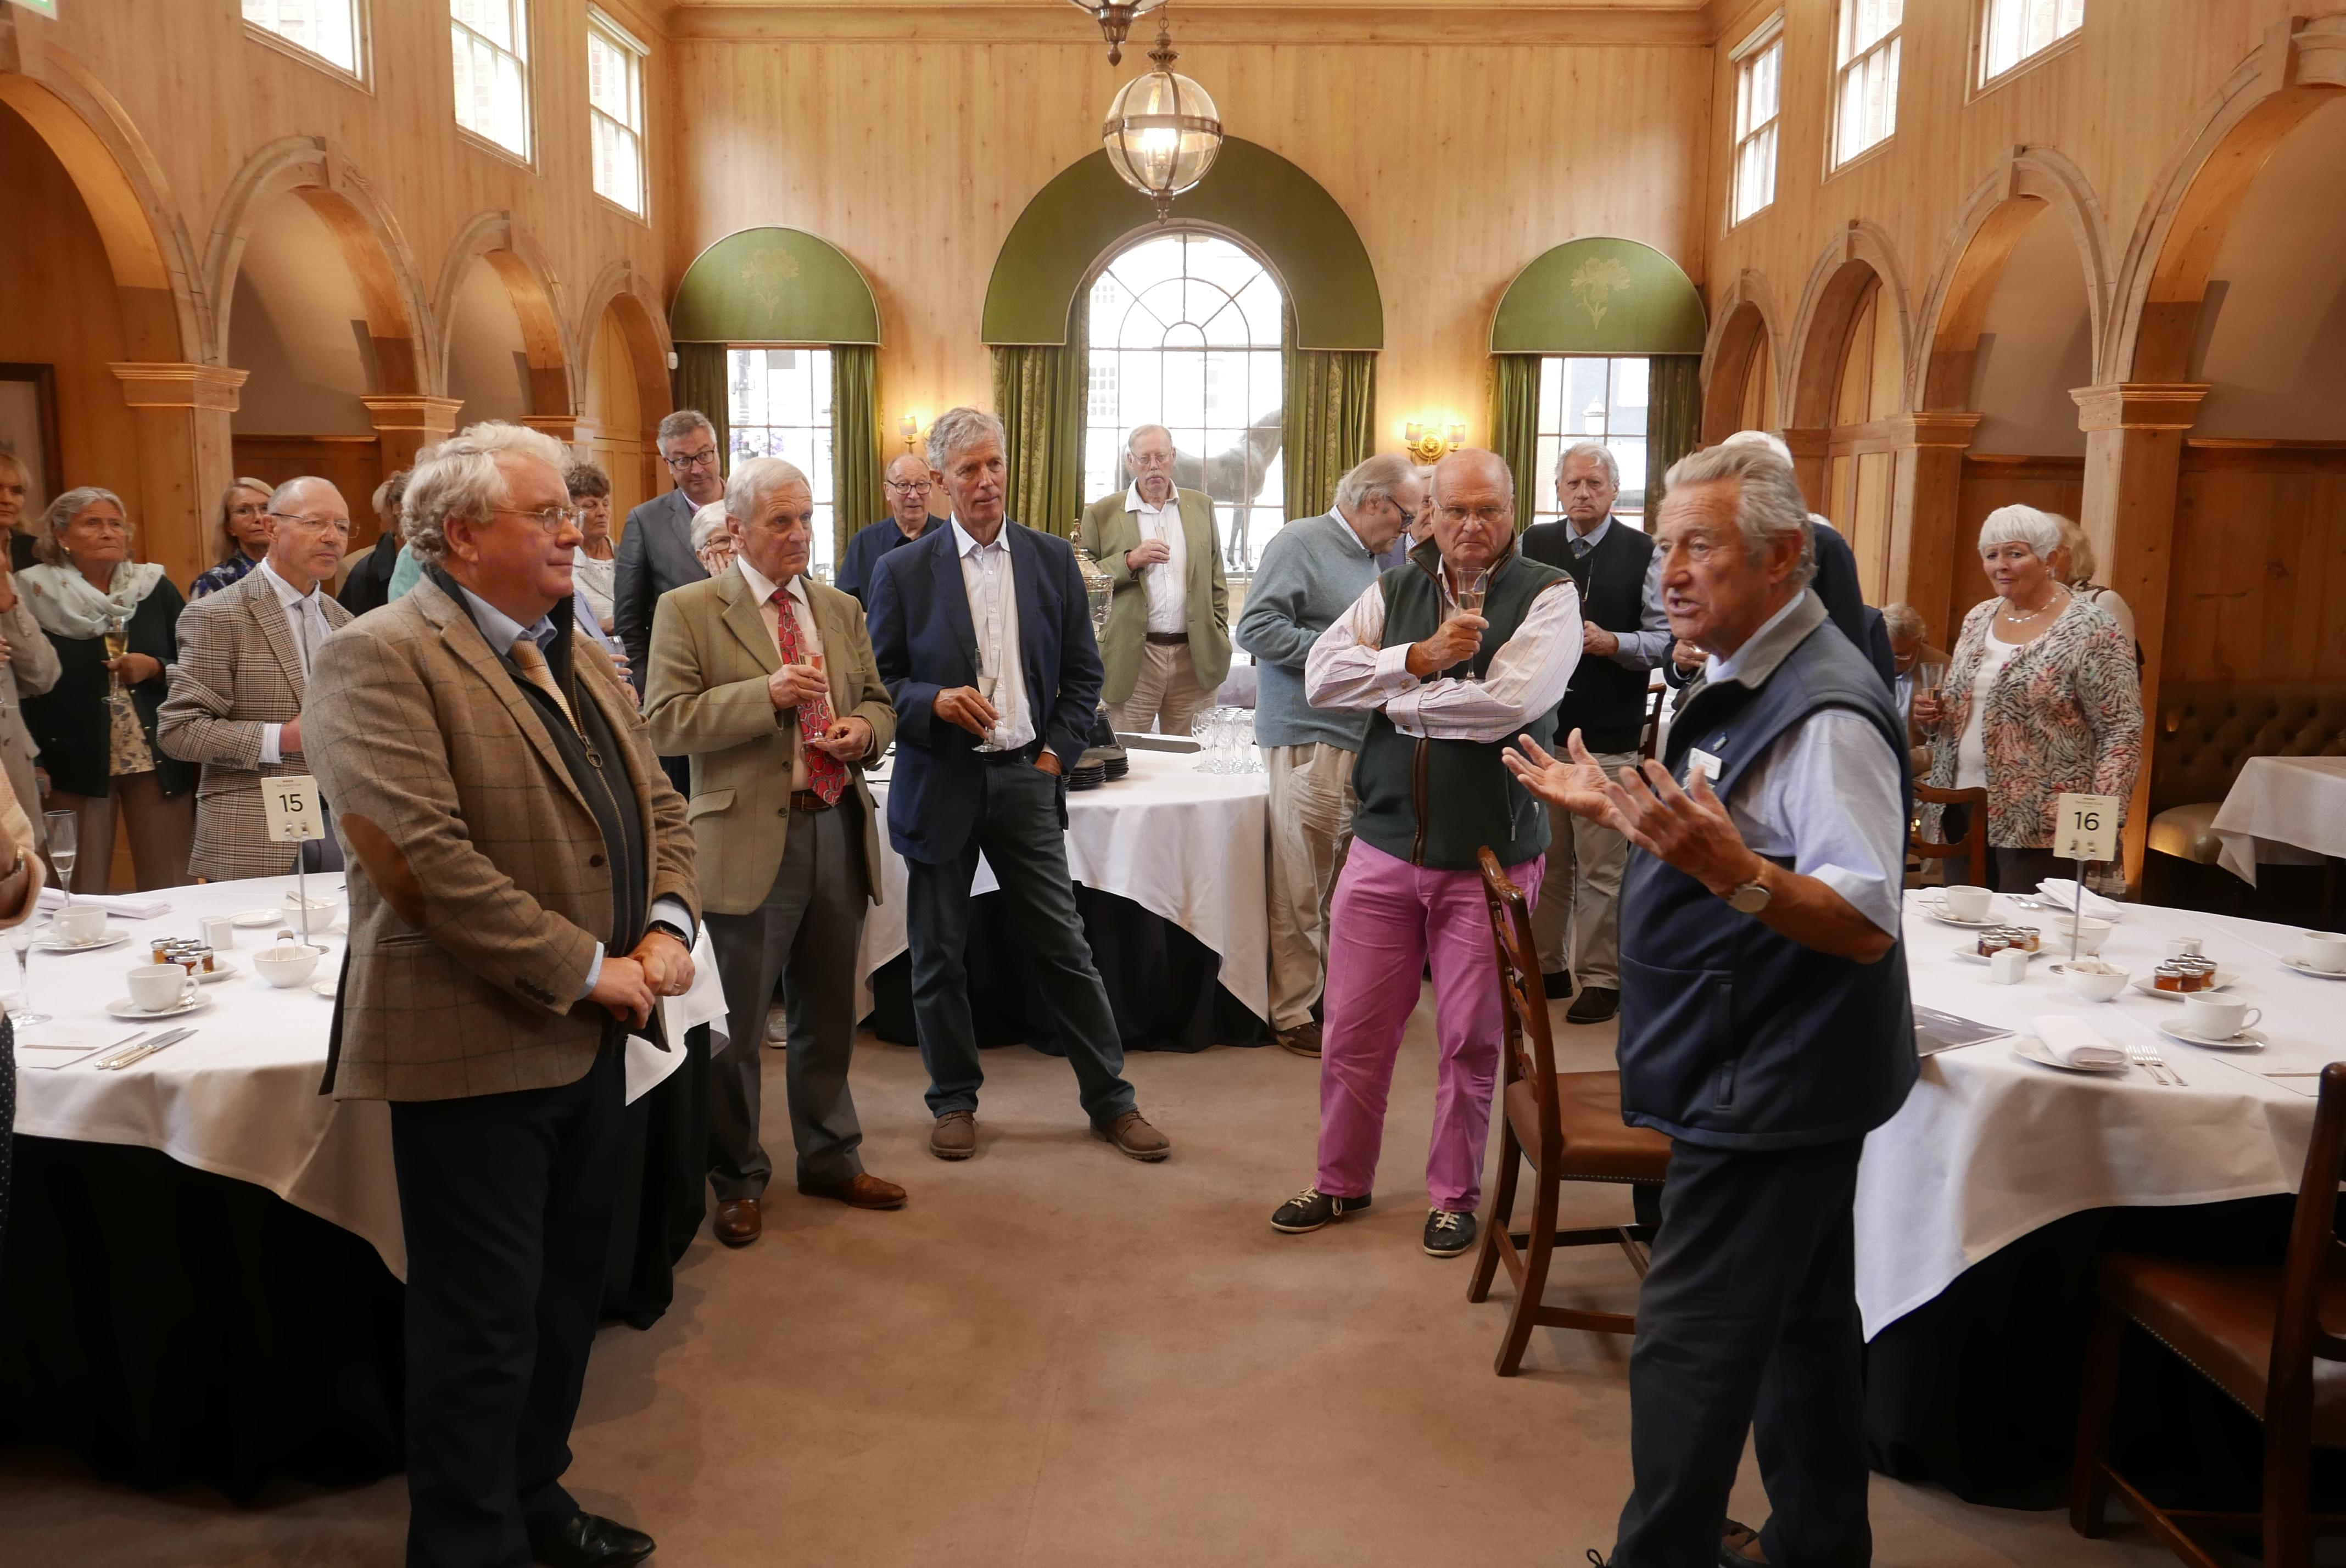 Liverymen visit The Jockey Club Rooms